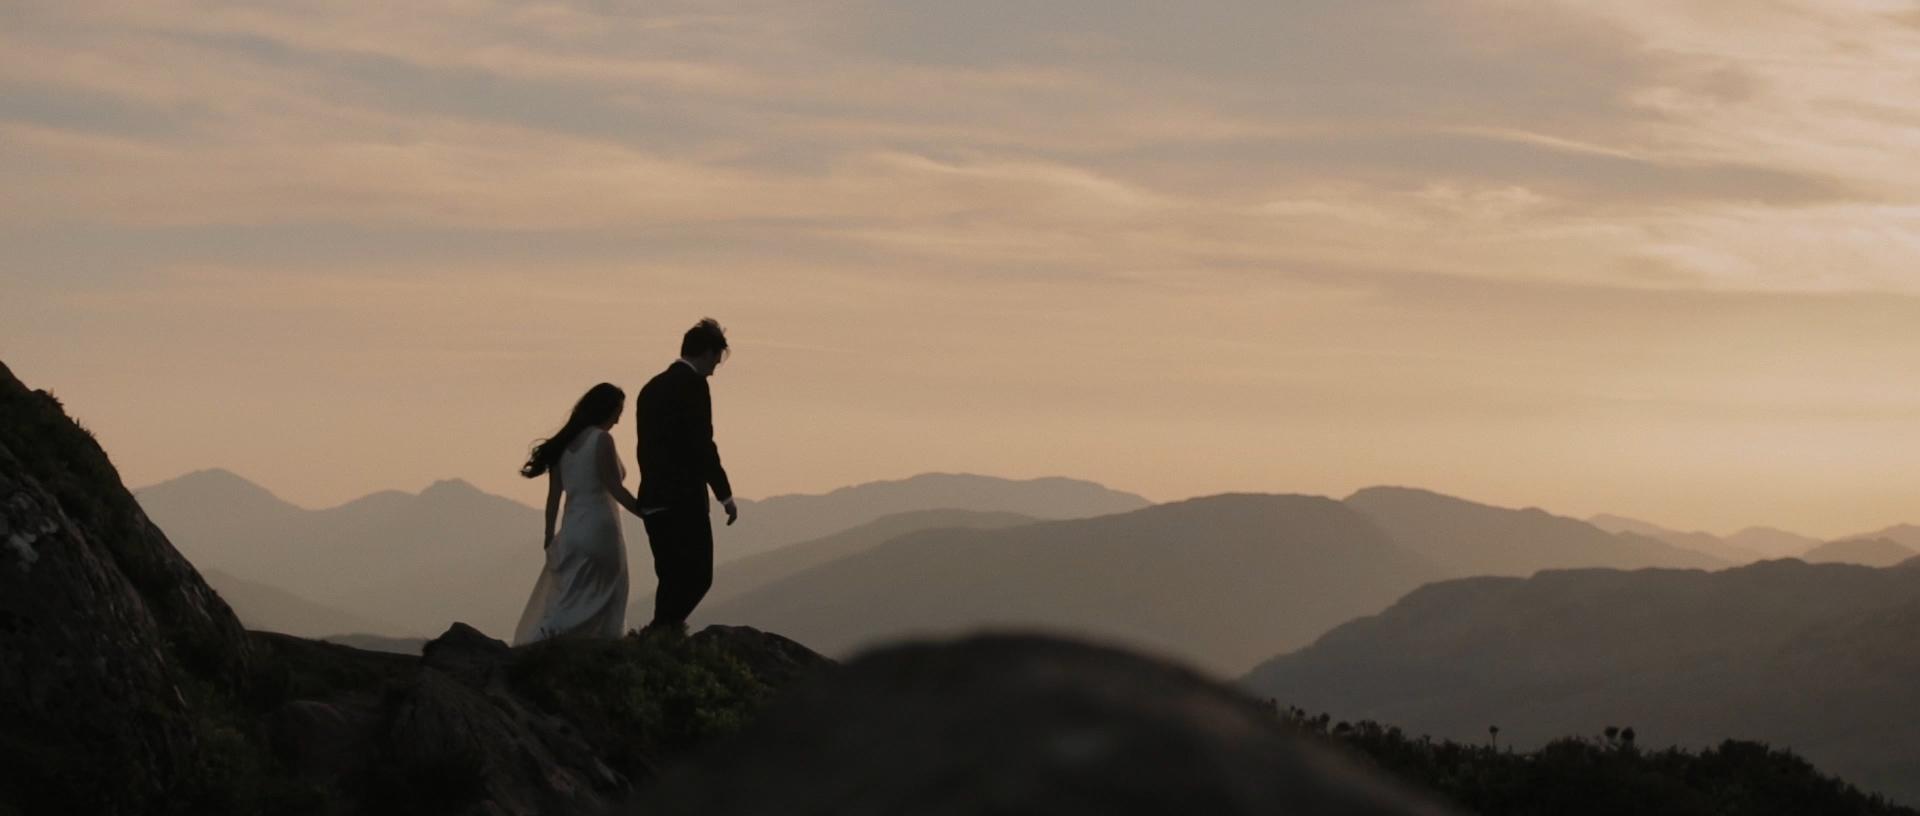 oswald-house-hotel-wedding-videographer_LL_01.jpg